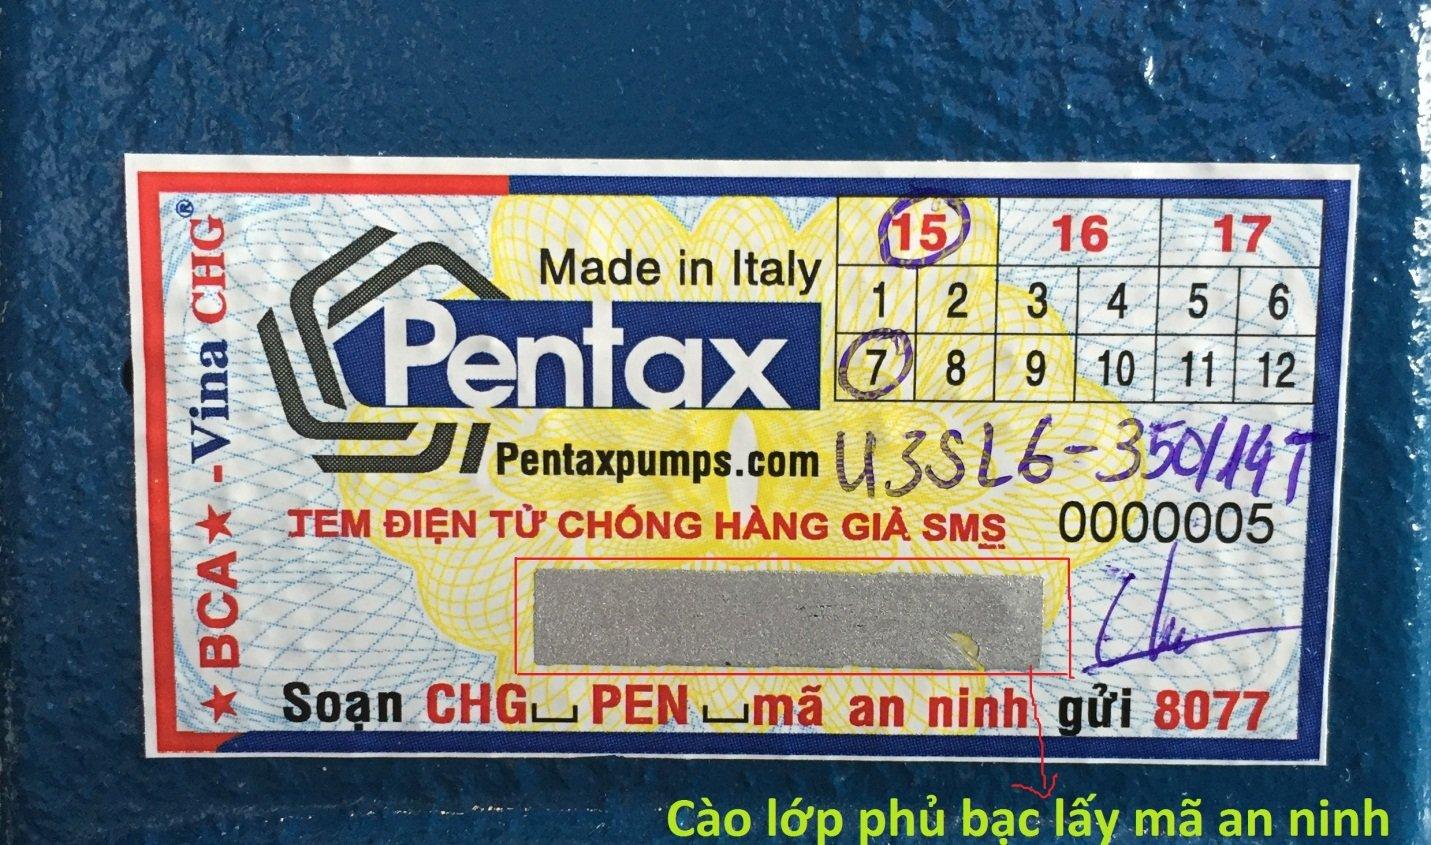 https://maybompentax.com.vn/images/2015/07/hth-chinh-thuc-ra-mat-tem-chong-hang-gia-cho-may-bom-pentax-3.jpg